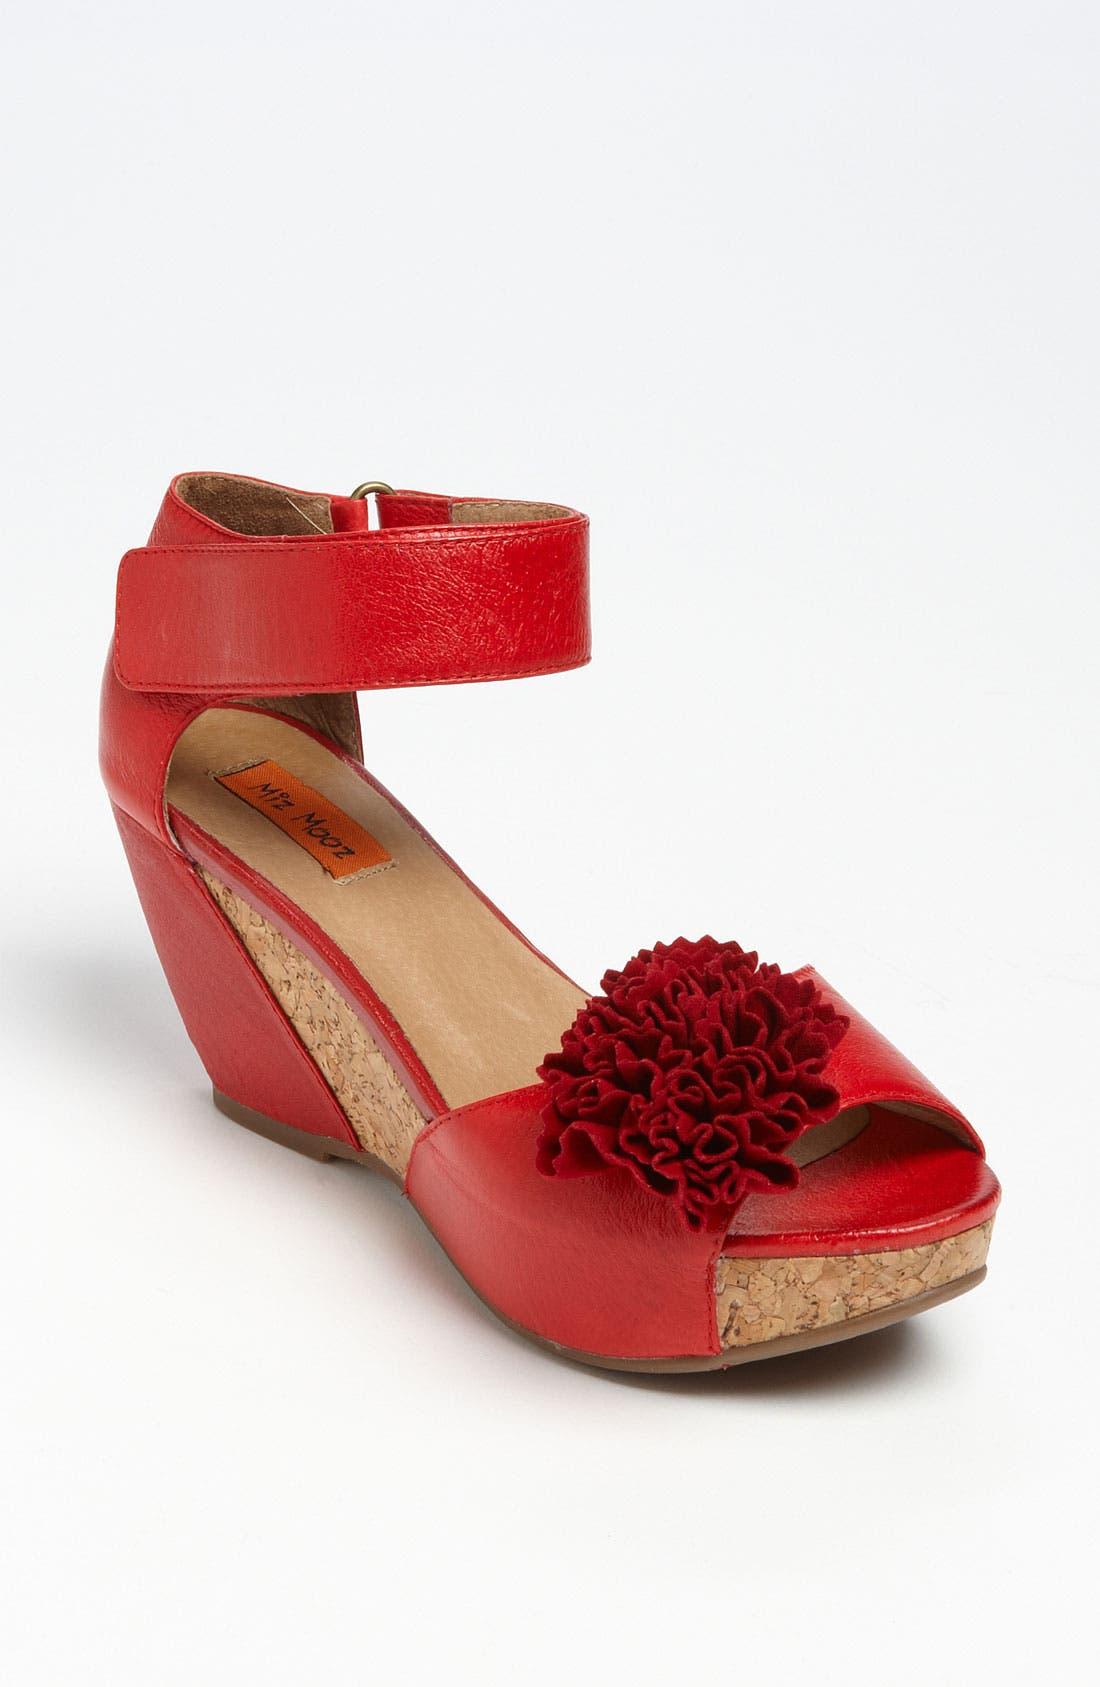 Alternate Image 1 Selected - Miz Mooz 'Yona' Wedge Sandal